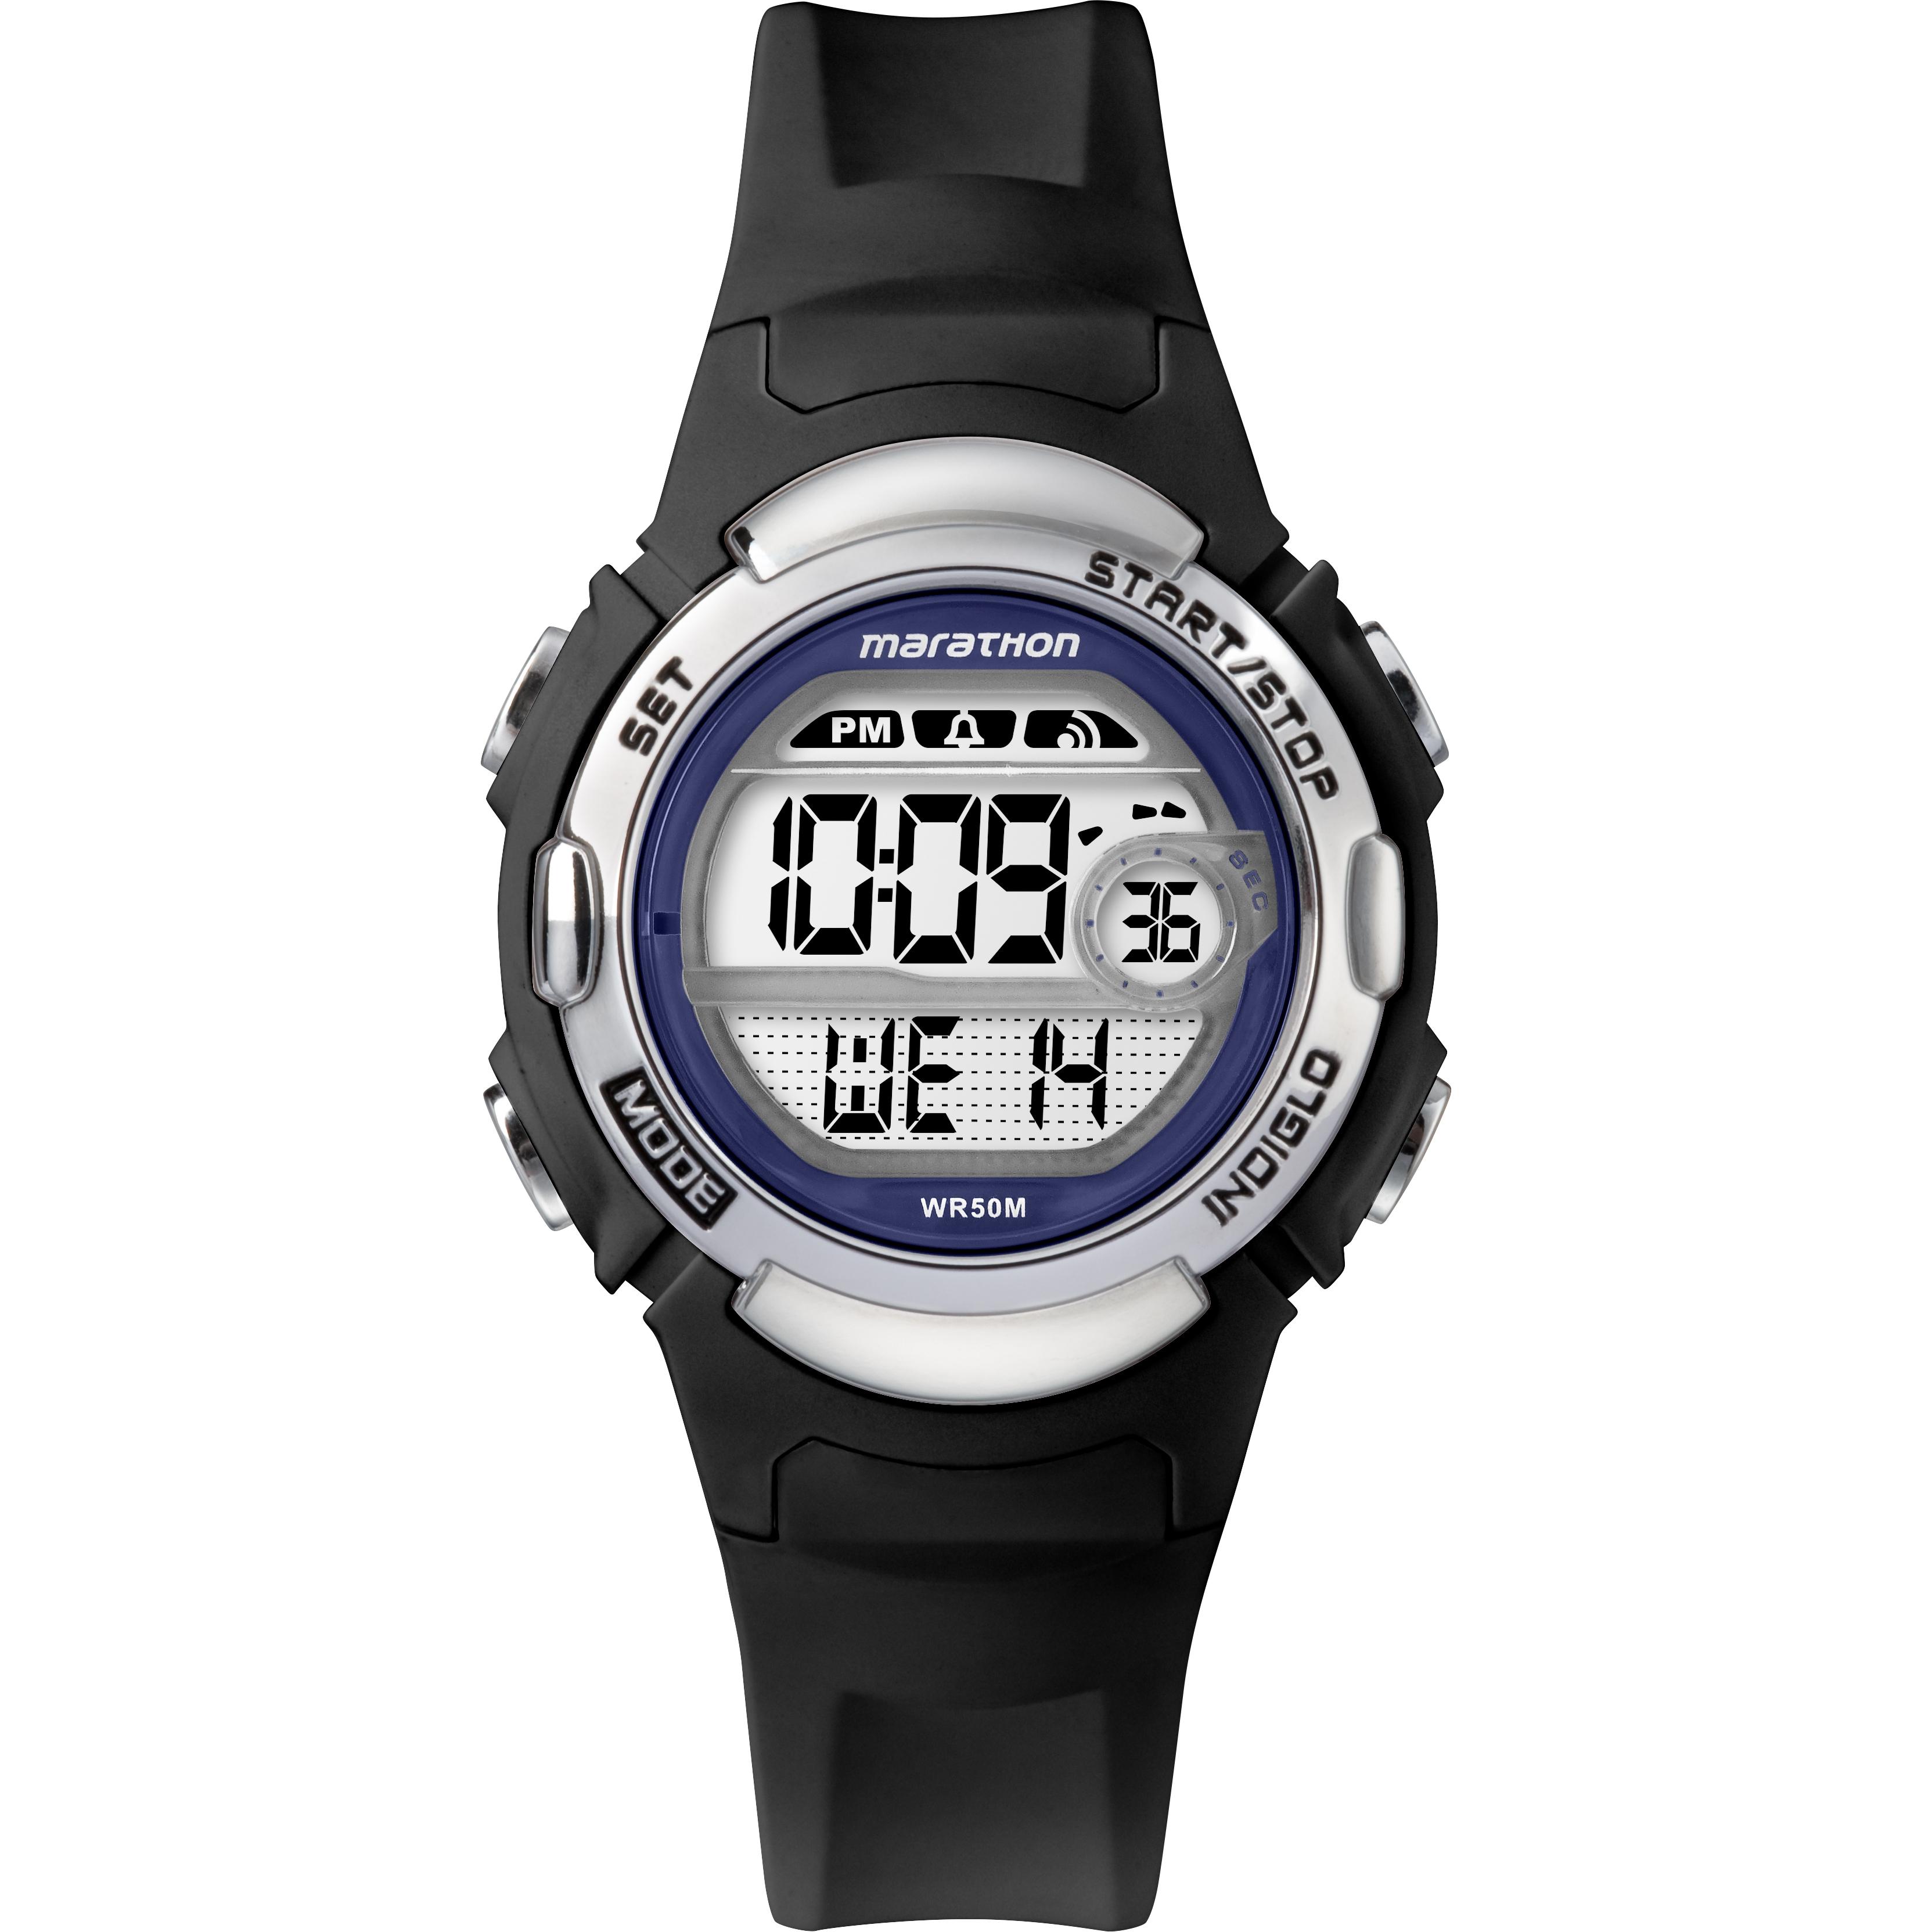 e8c2c11b1060 Timex Digital Mid Marathon